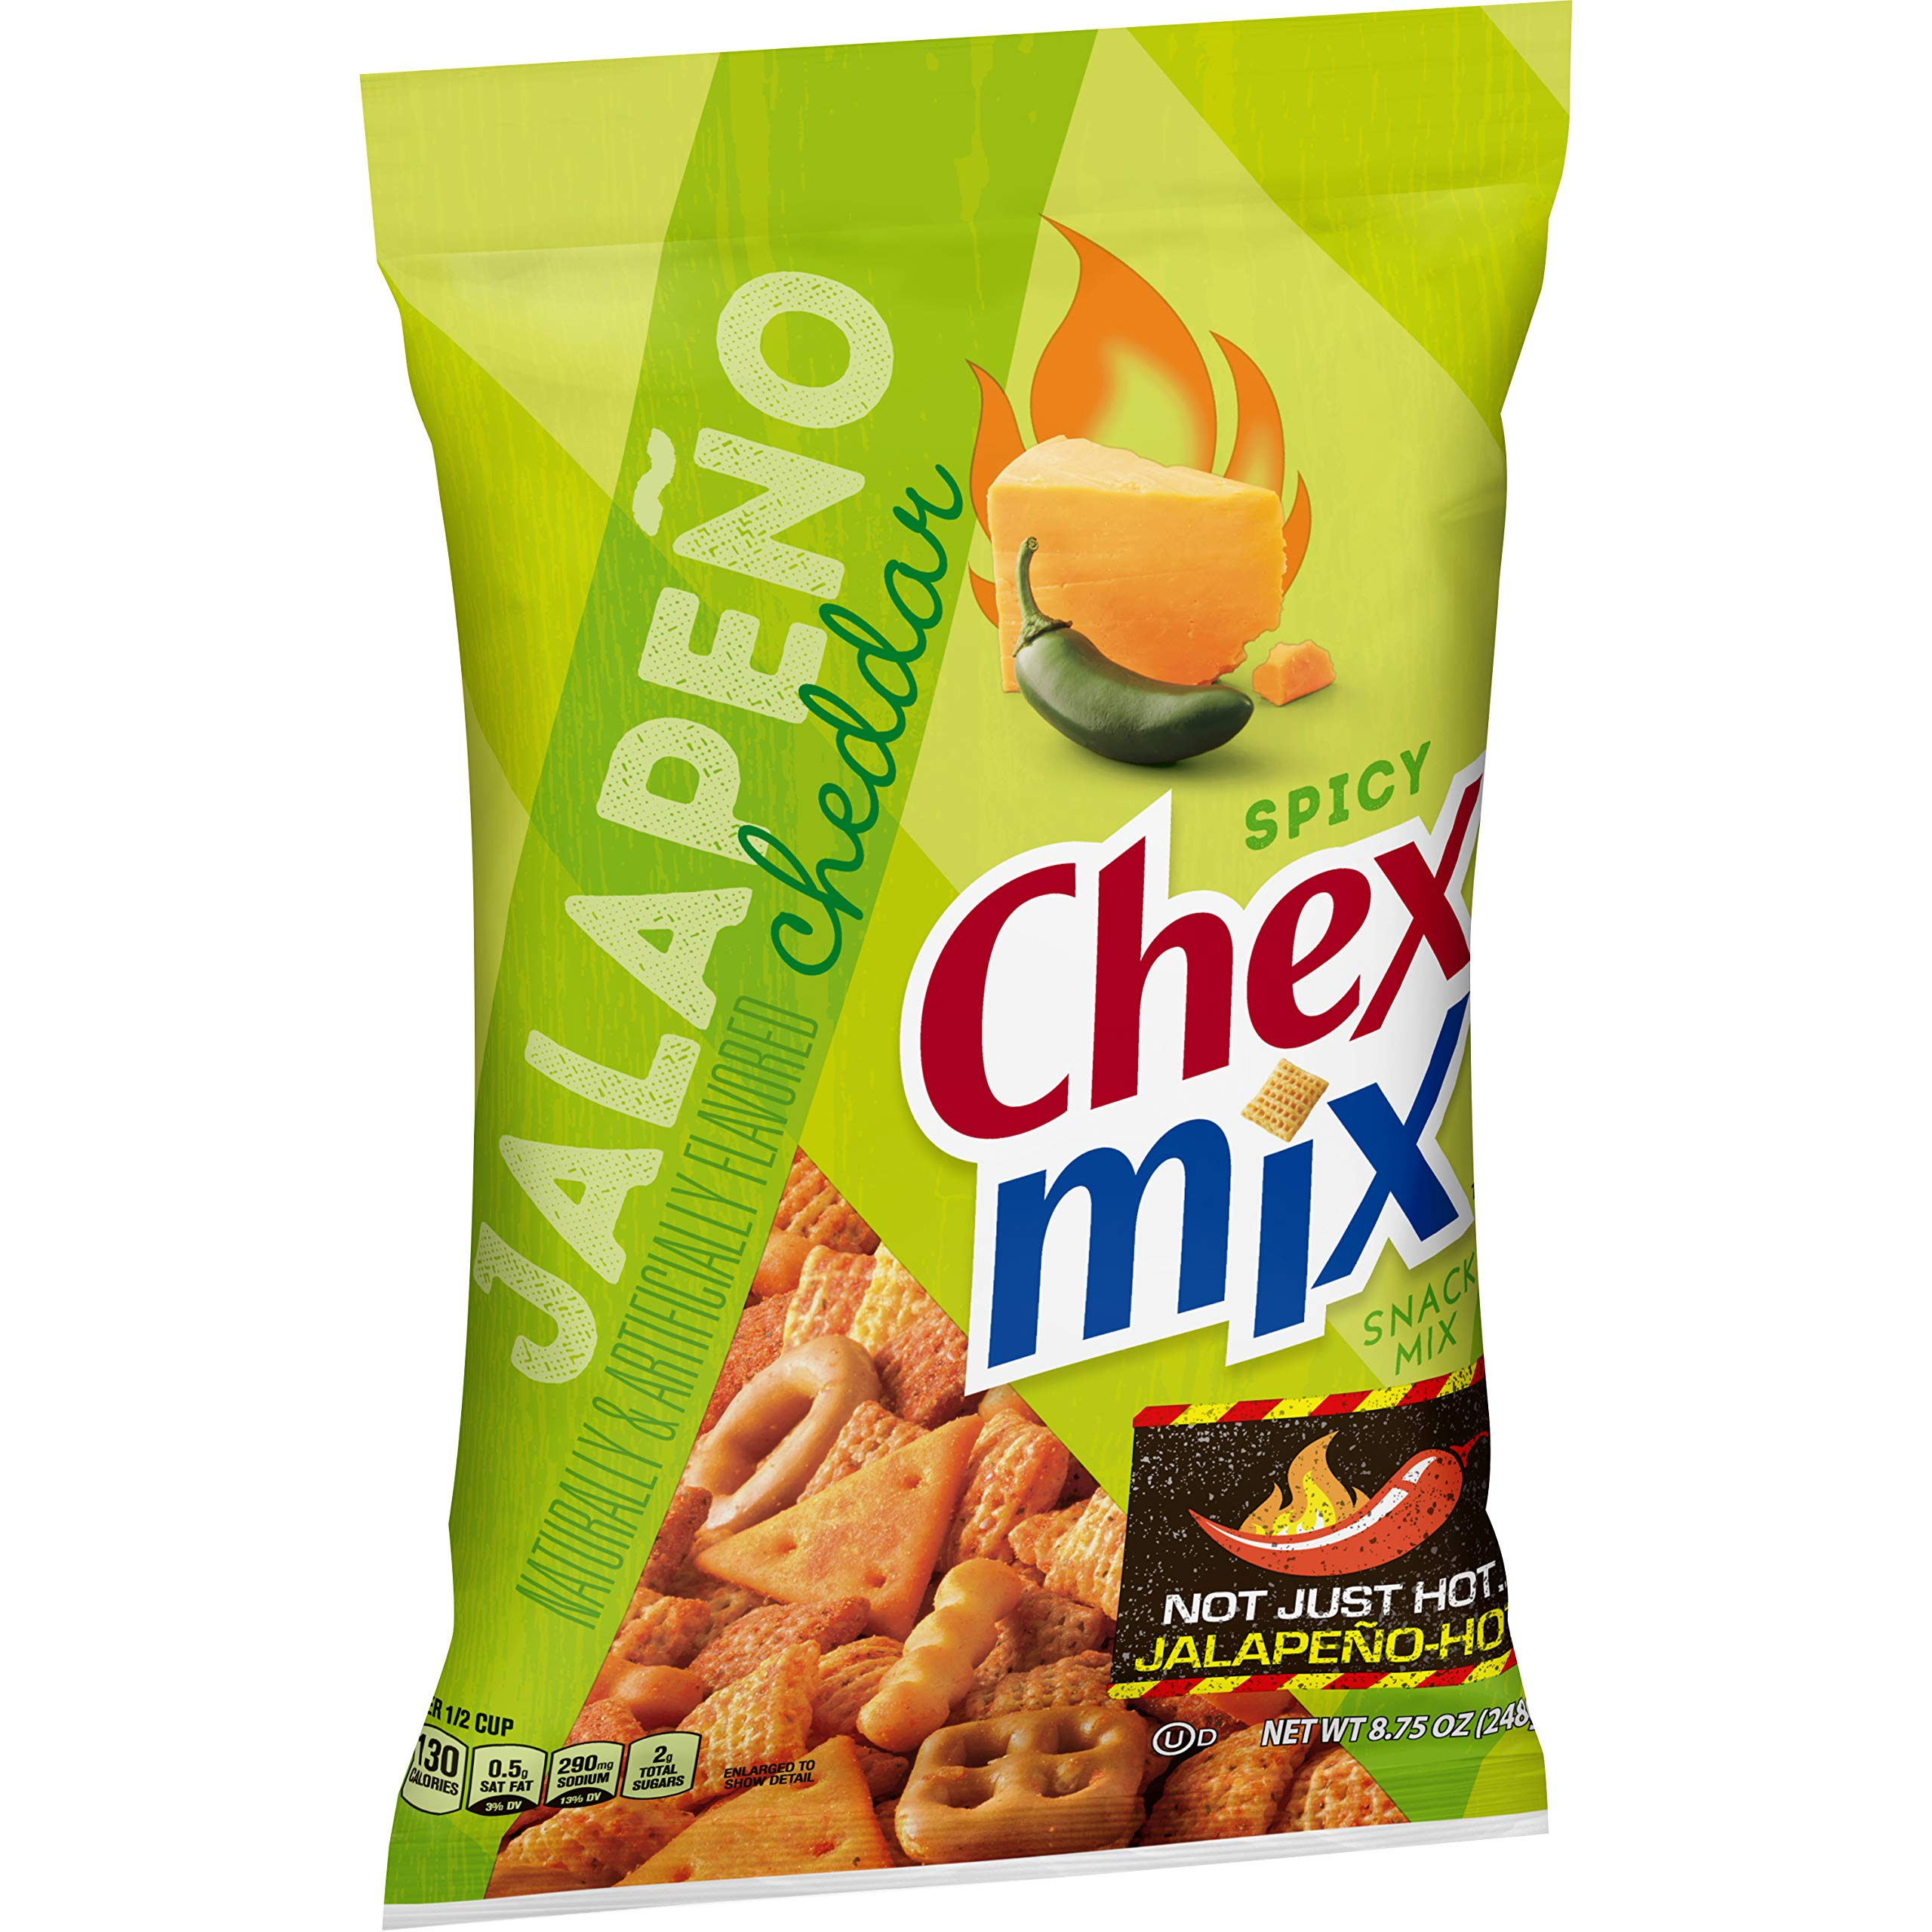 Chex Mix, Snack Mix, Jalapeno Cheddar, 8.75 oz. Bag